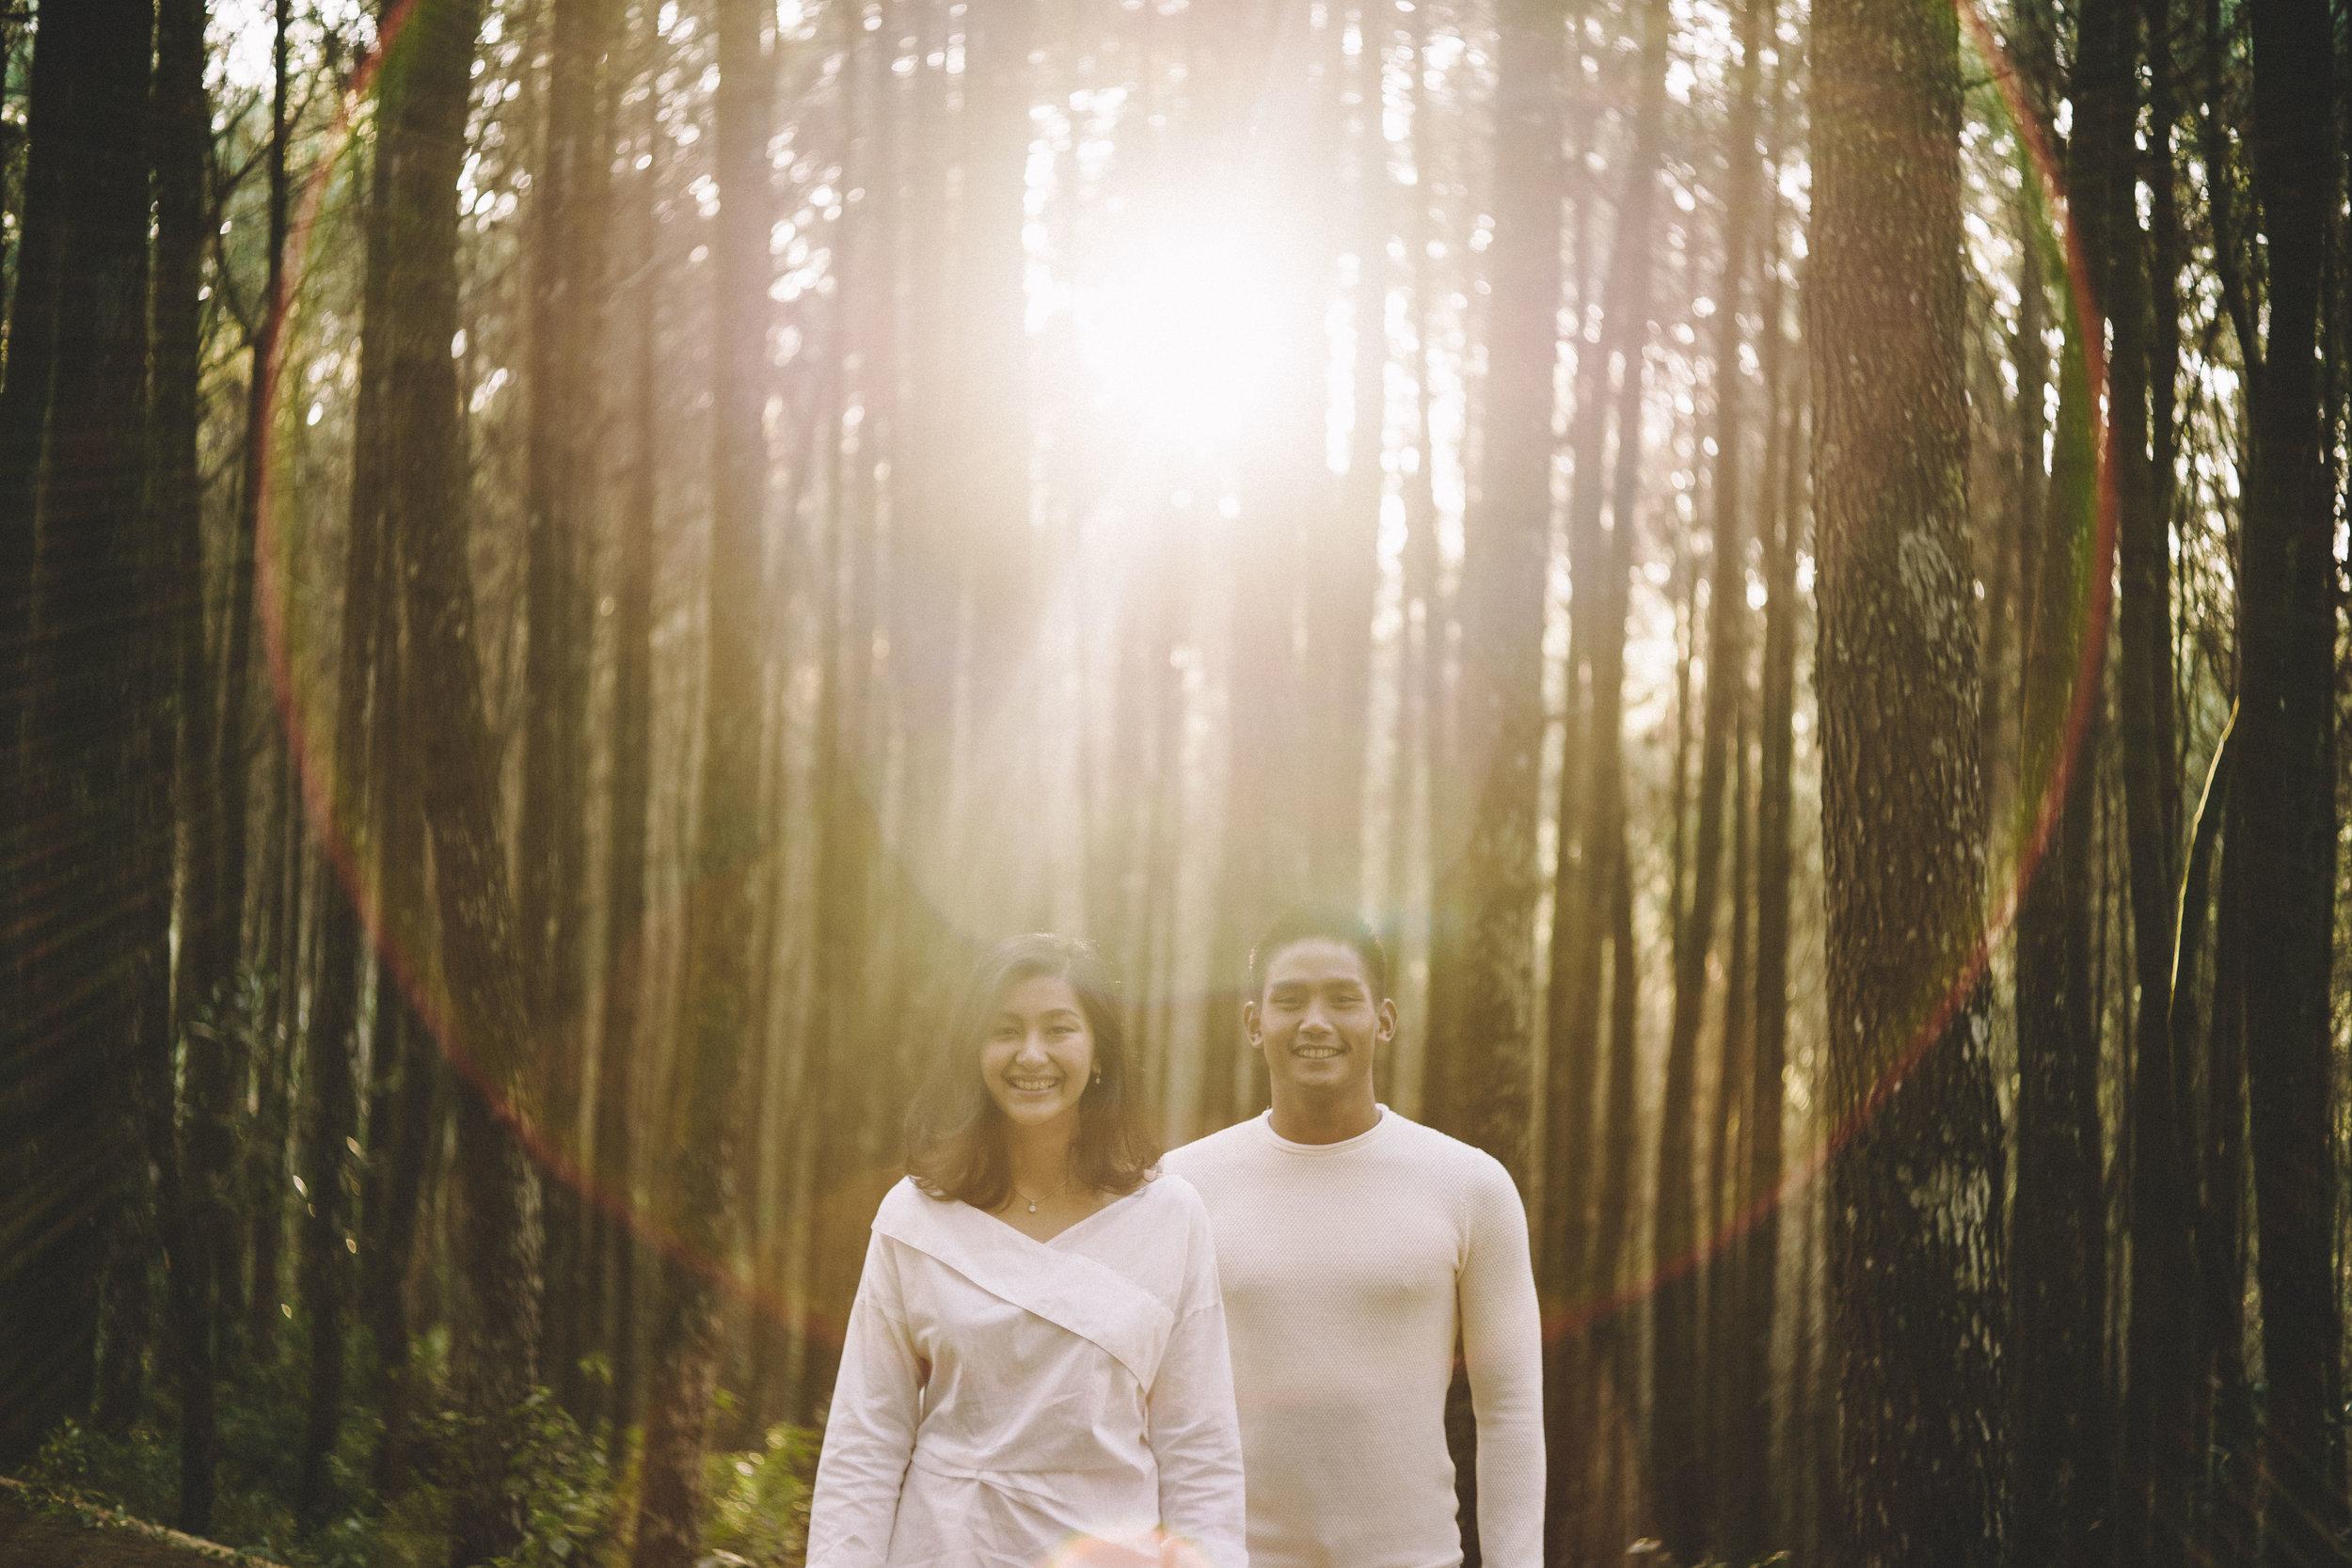 winny-panggah-couple-session-213.jpg